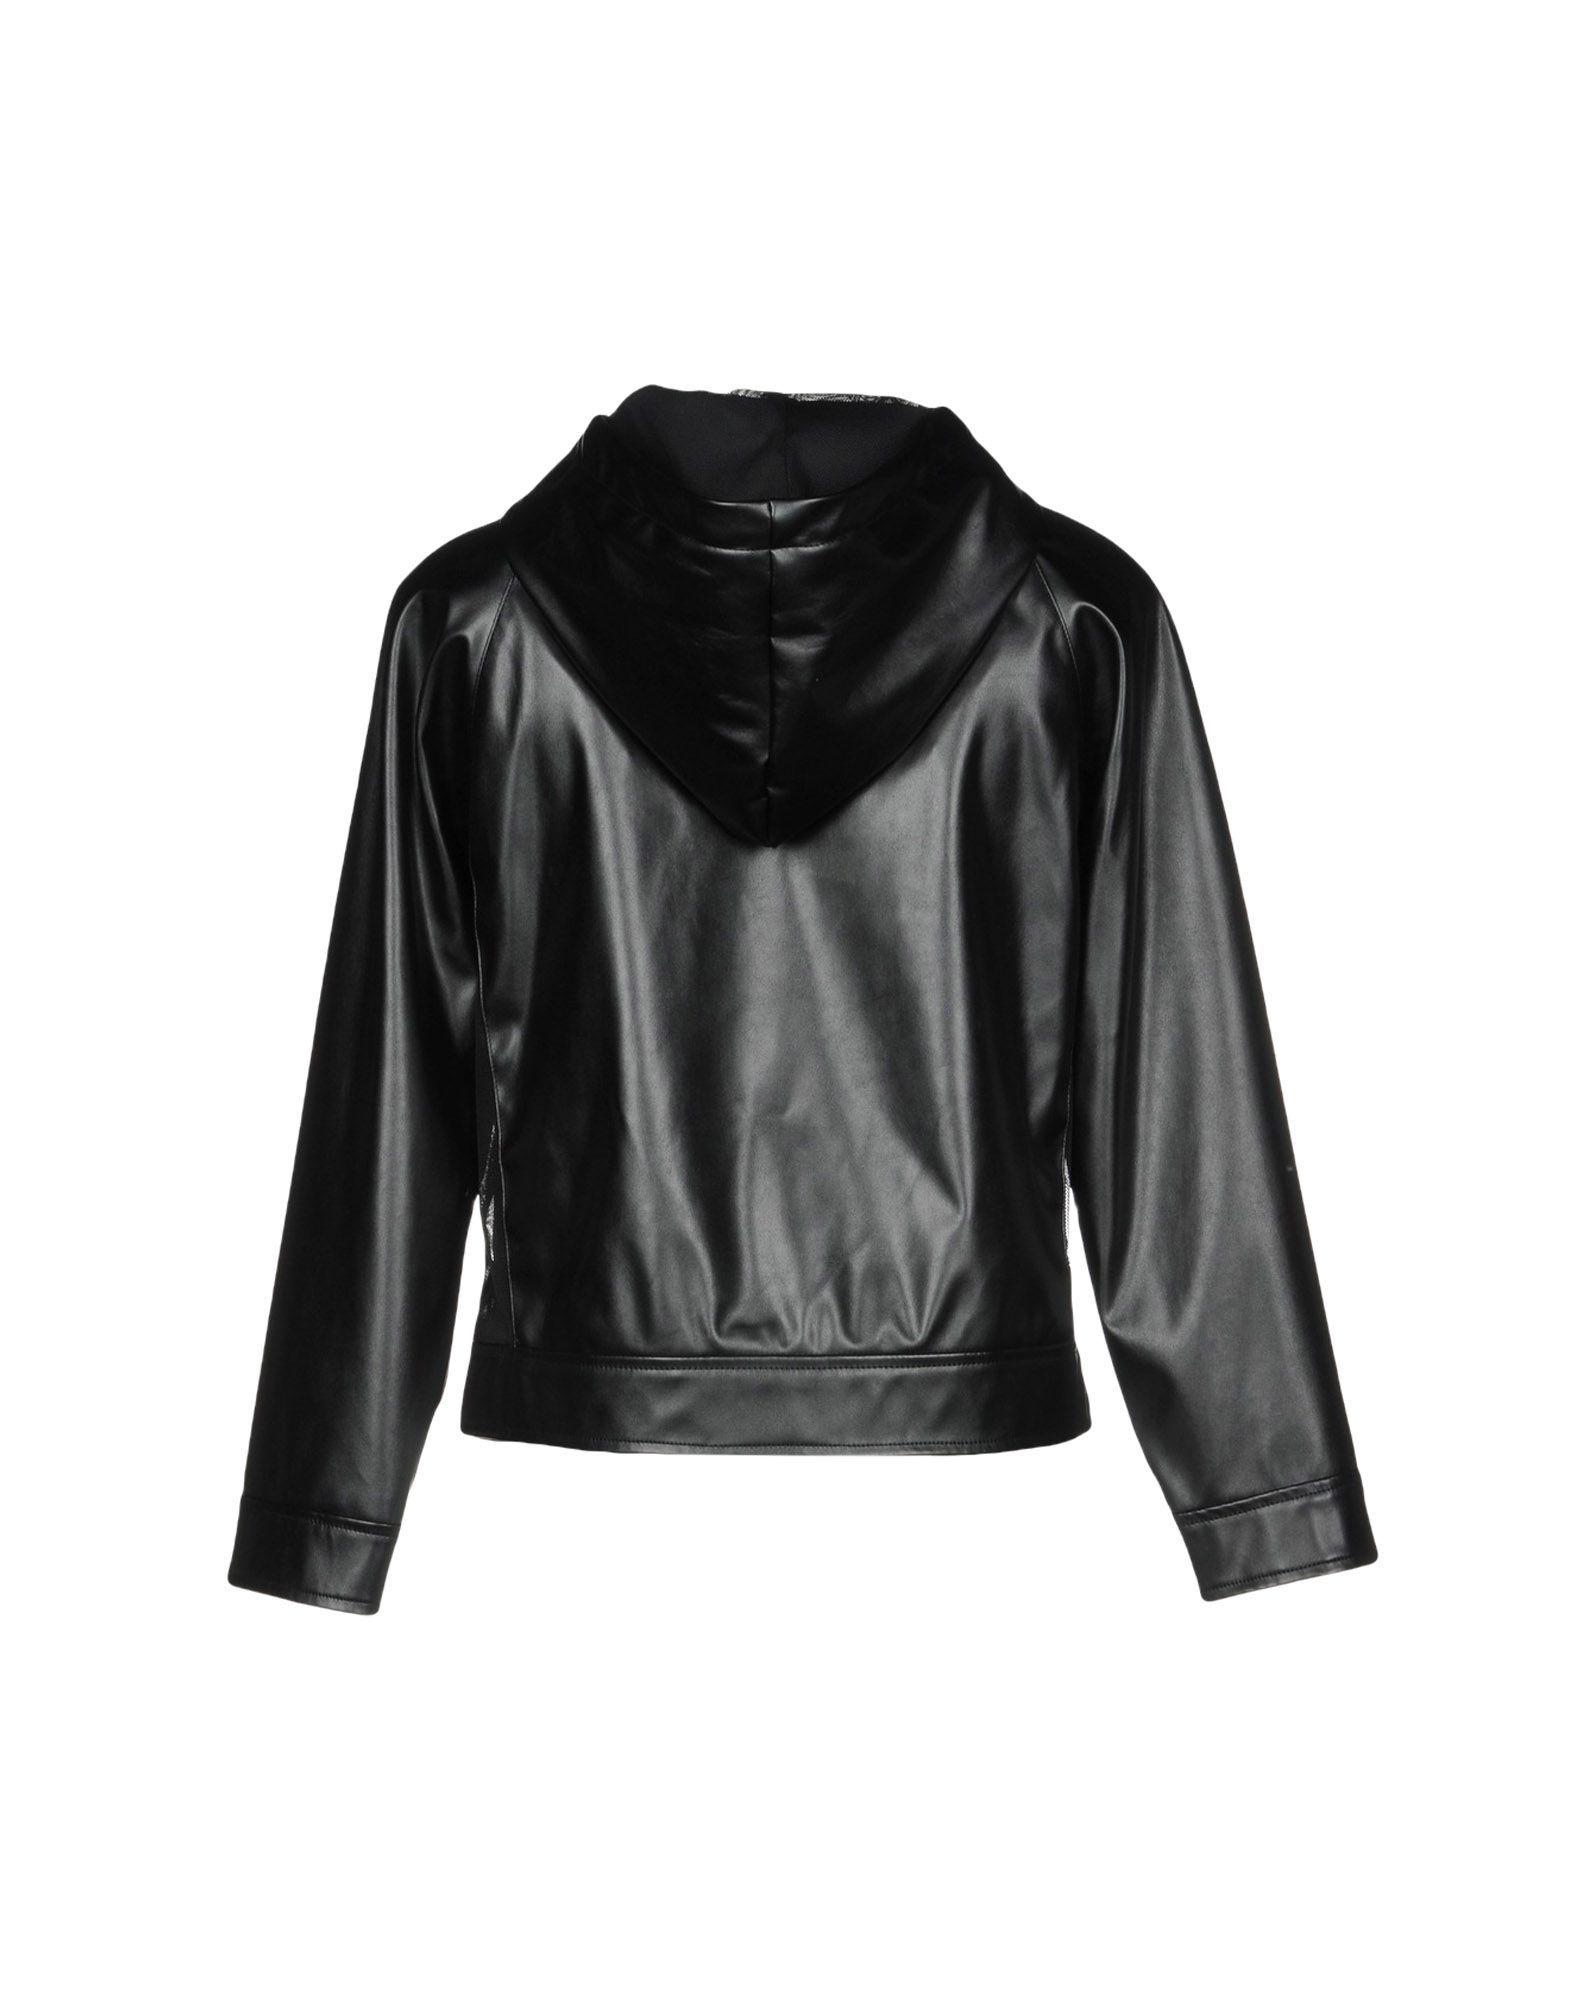 Roÿ Roger's Black Faux Leather Biker Jacket